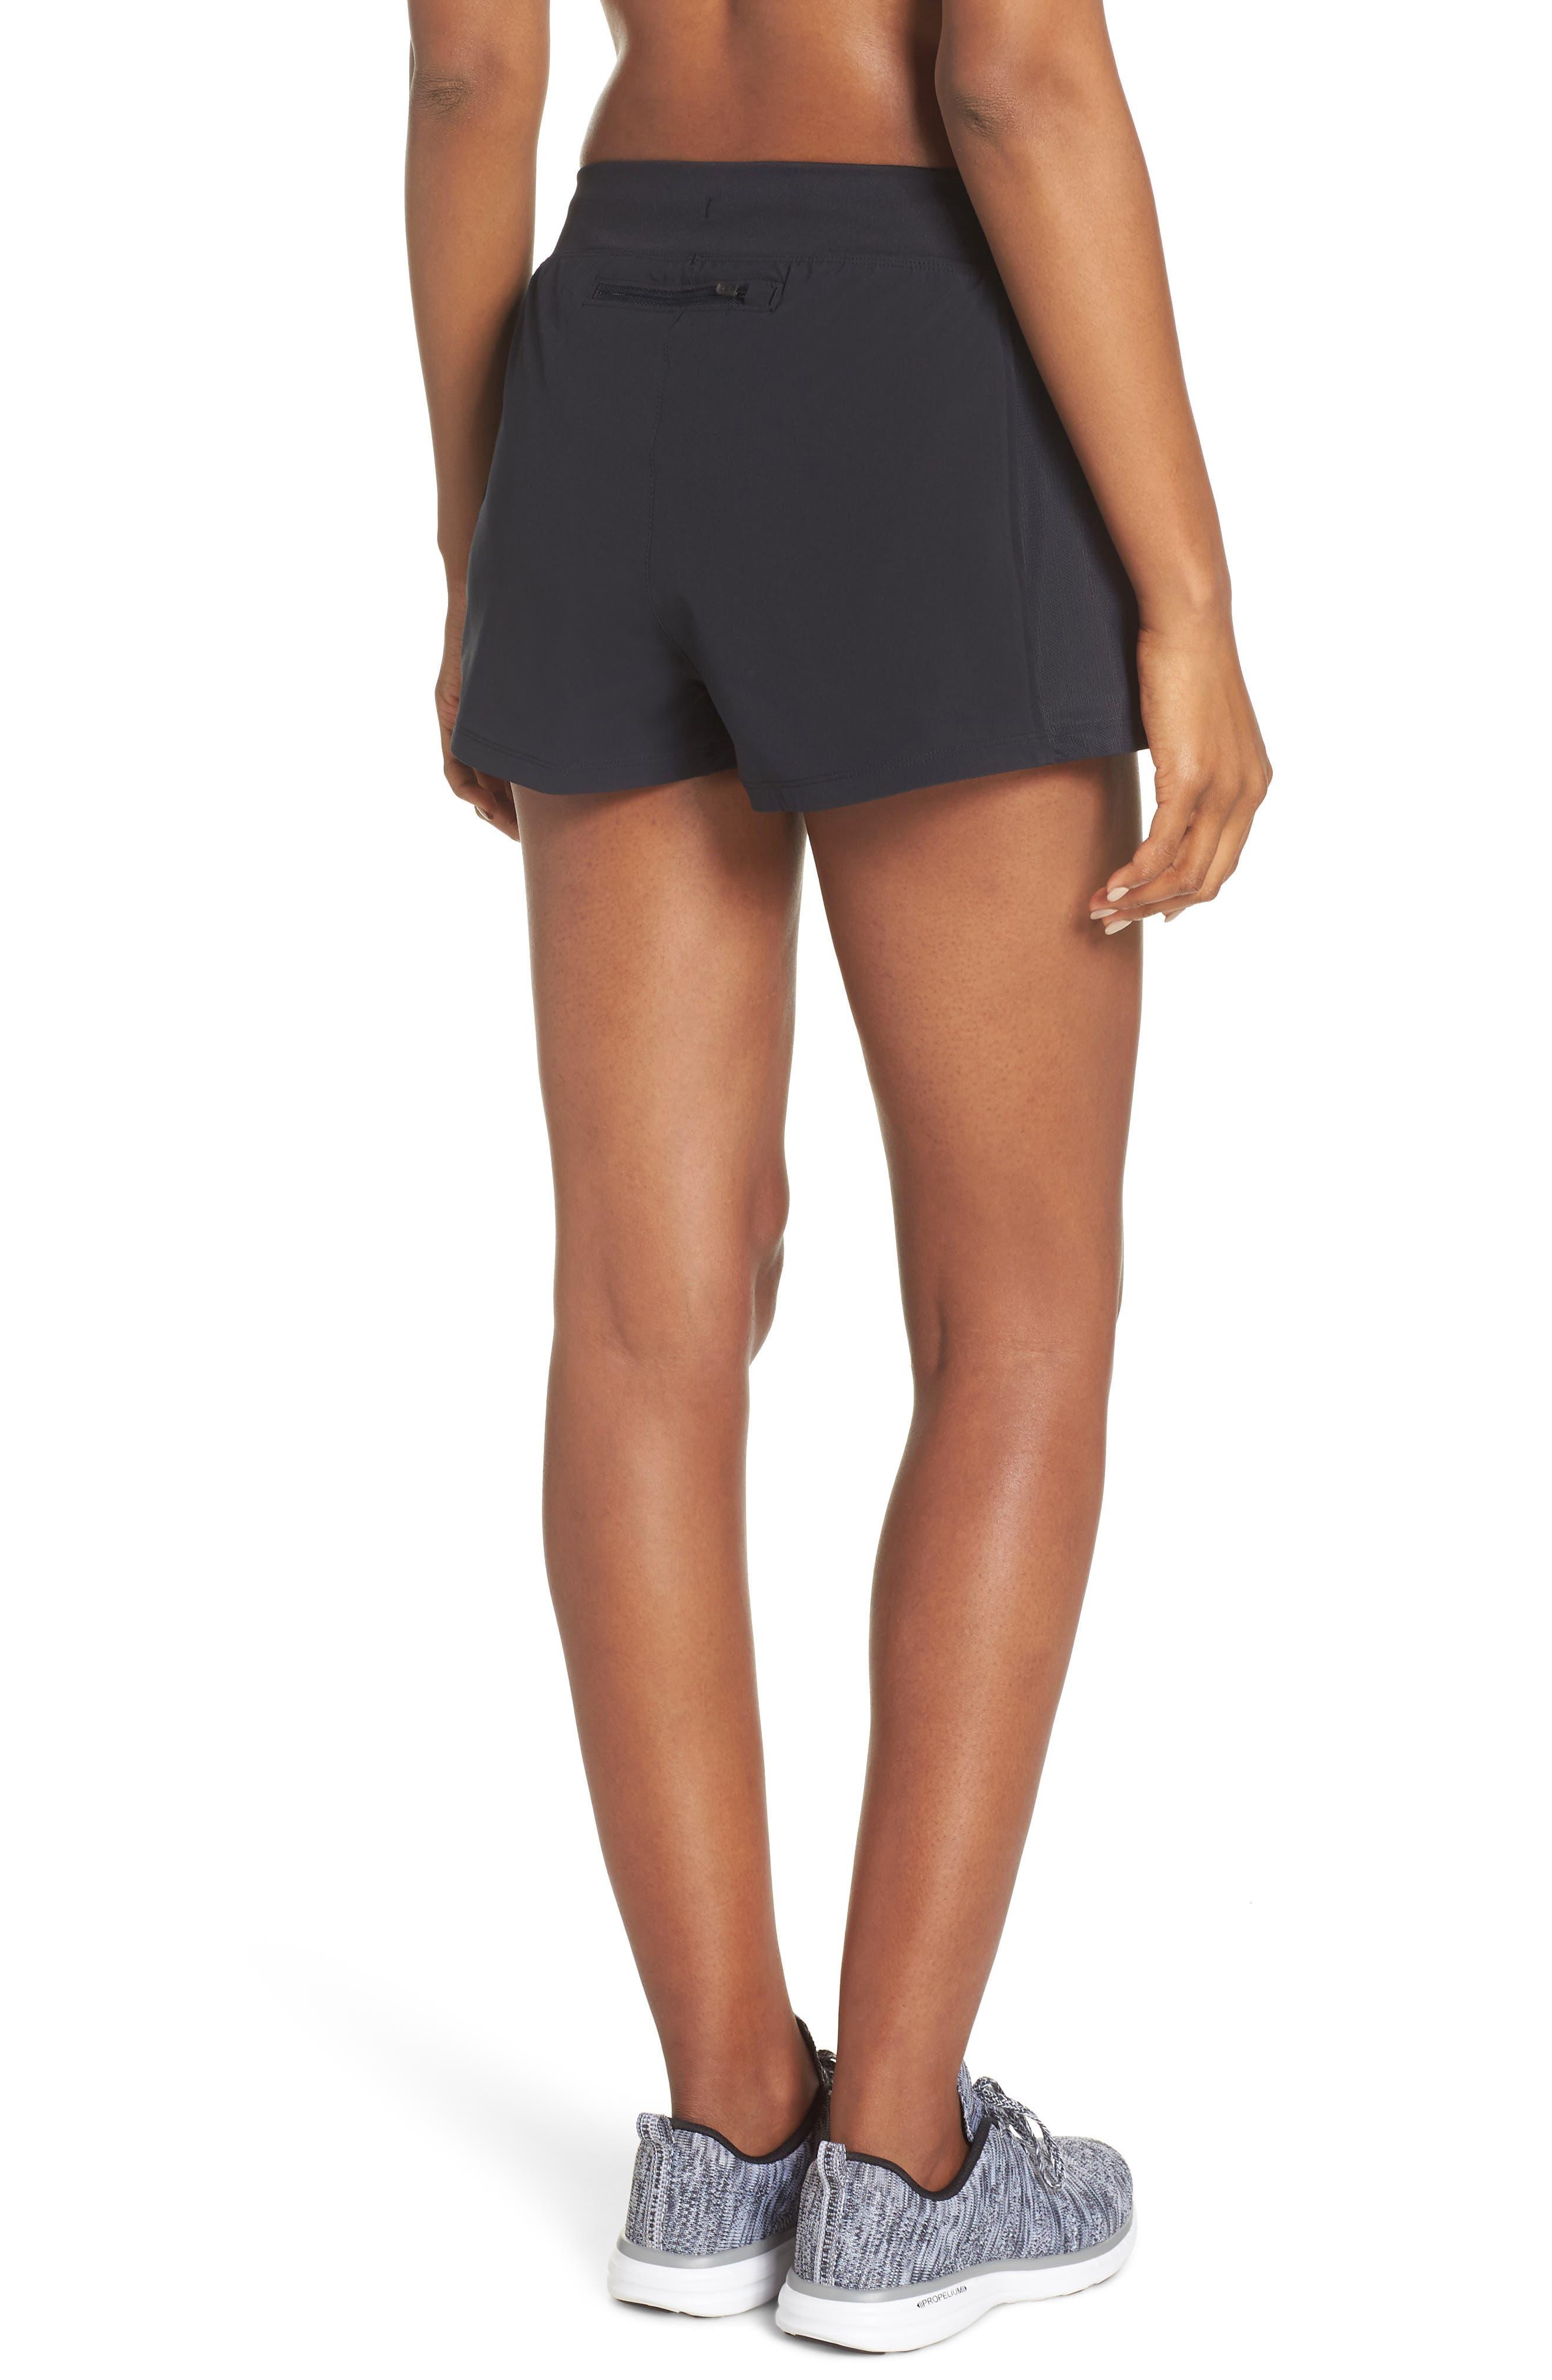 Speedpocket Shorts,                             Alternate thumbnail 2, color,                             BLACK/ BLACK/ REFLECTIVE